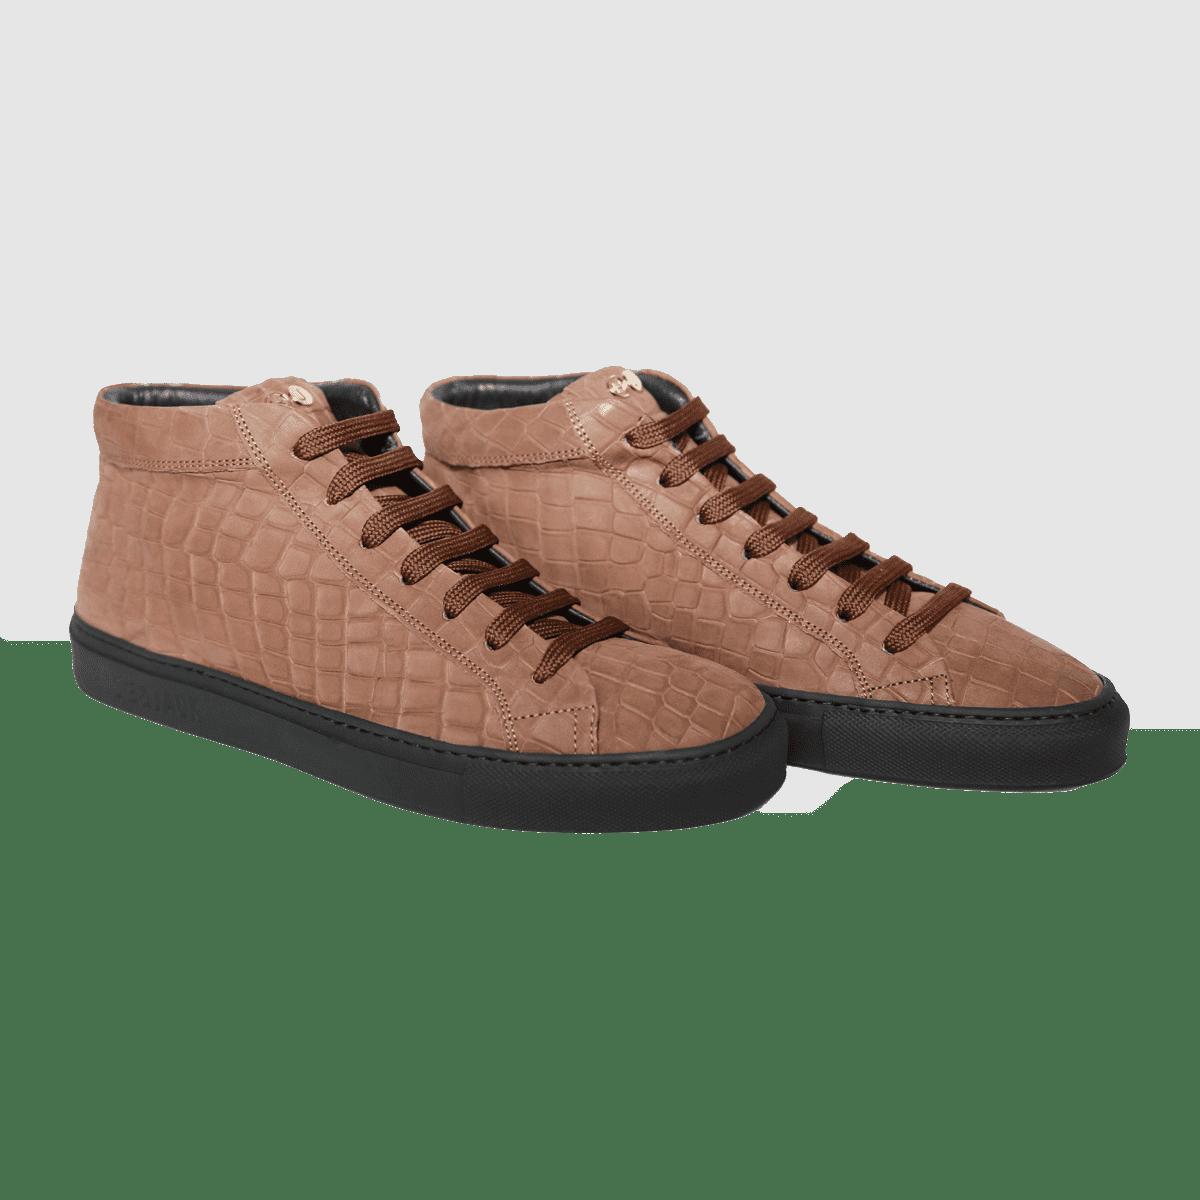 Cabinero Stiles Mensfashion Hide&Jack Boots in Berlin neue Kollektion AW2017/18-22